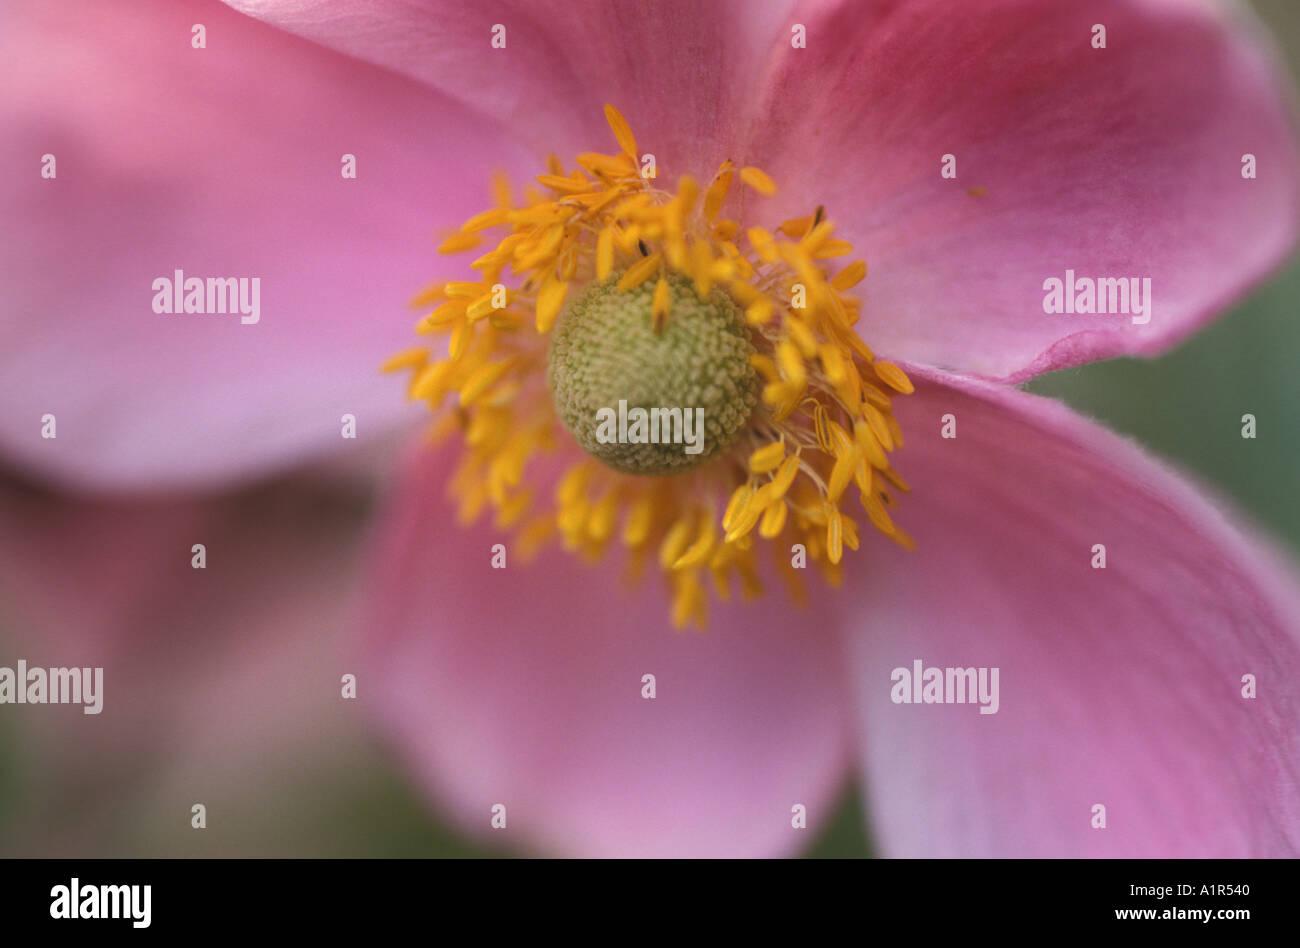 Pink blossom, close-up Stock Photo